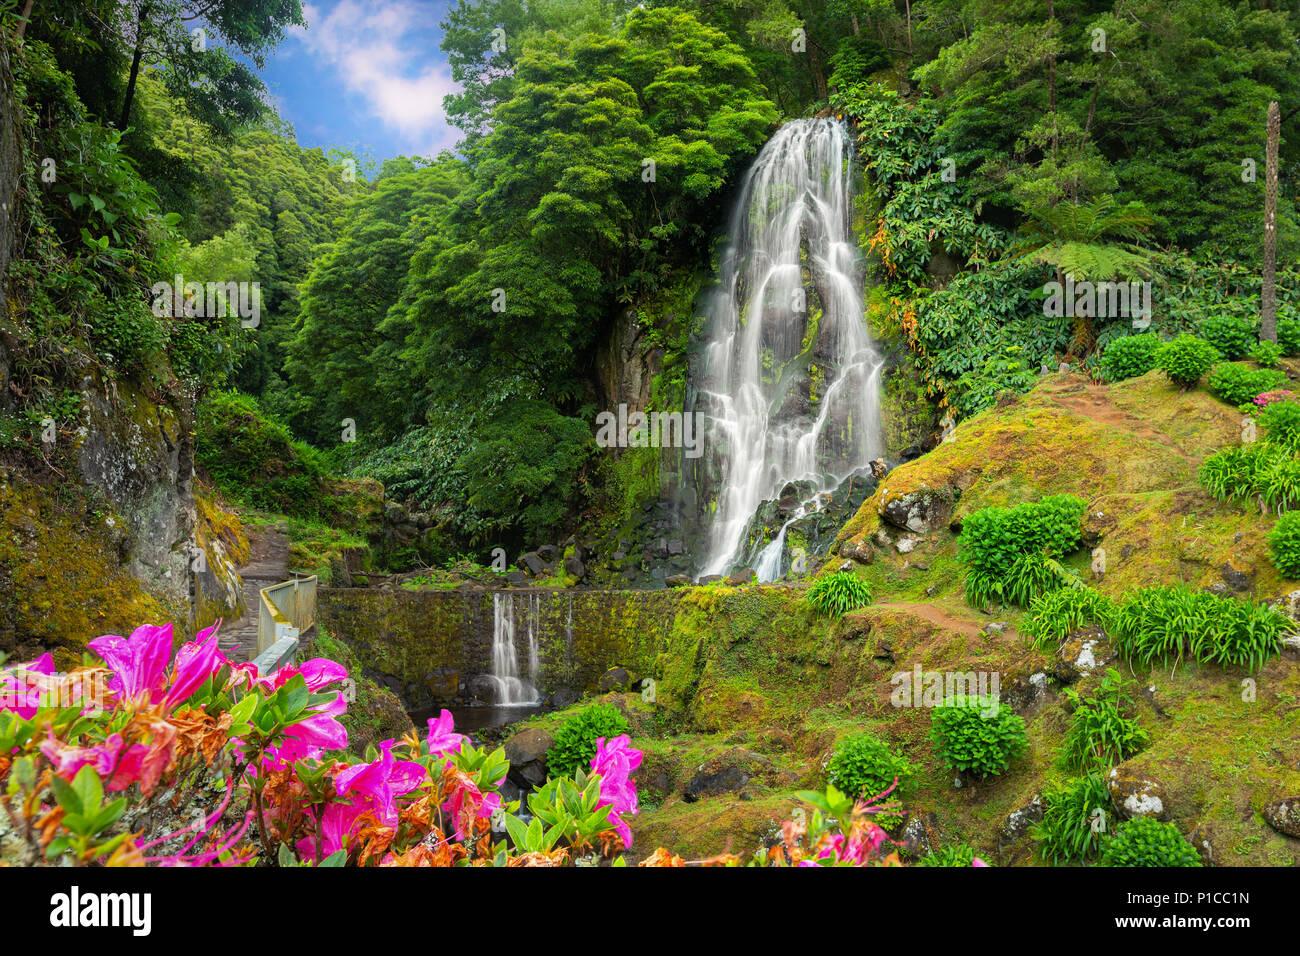 Veu da Noiva waterfall, Sao Miguel island, Azores, Portugal - Stock Image